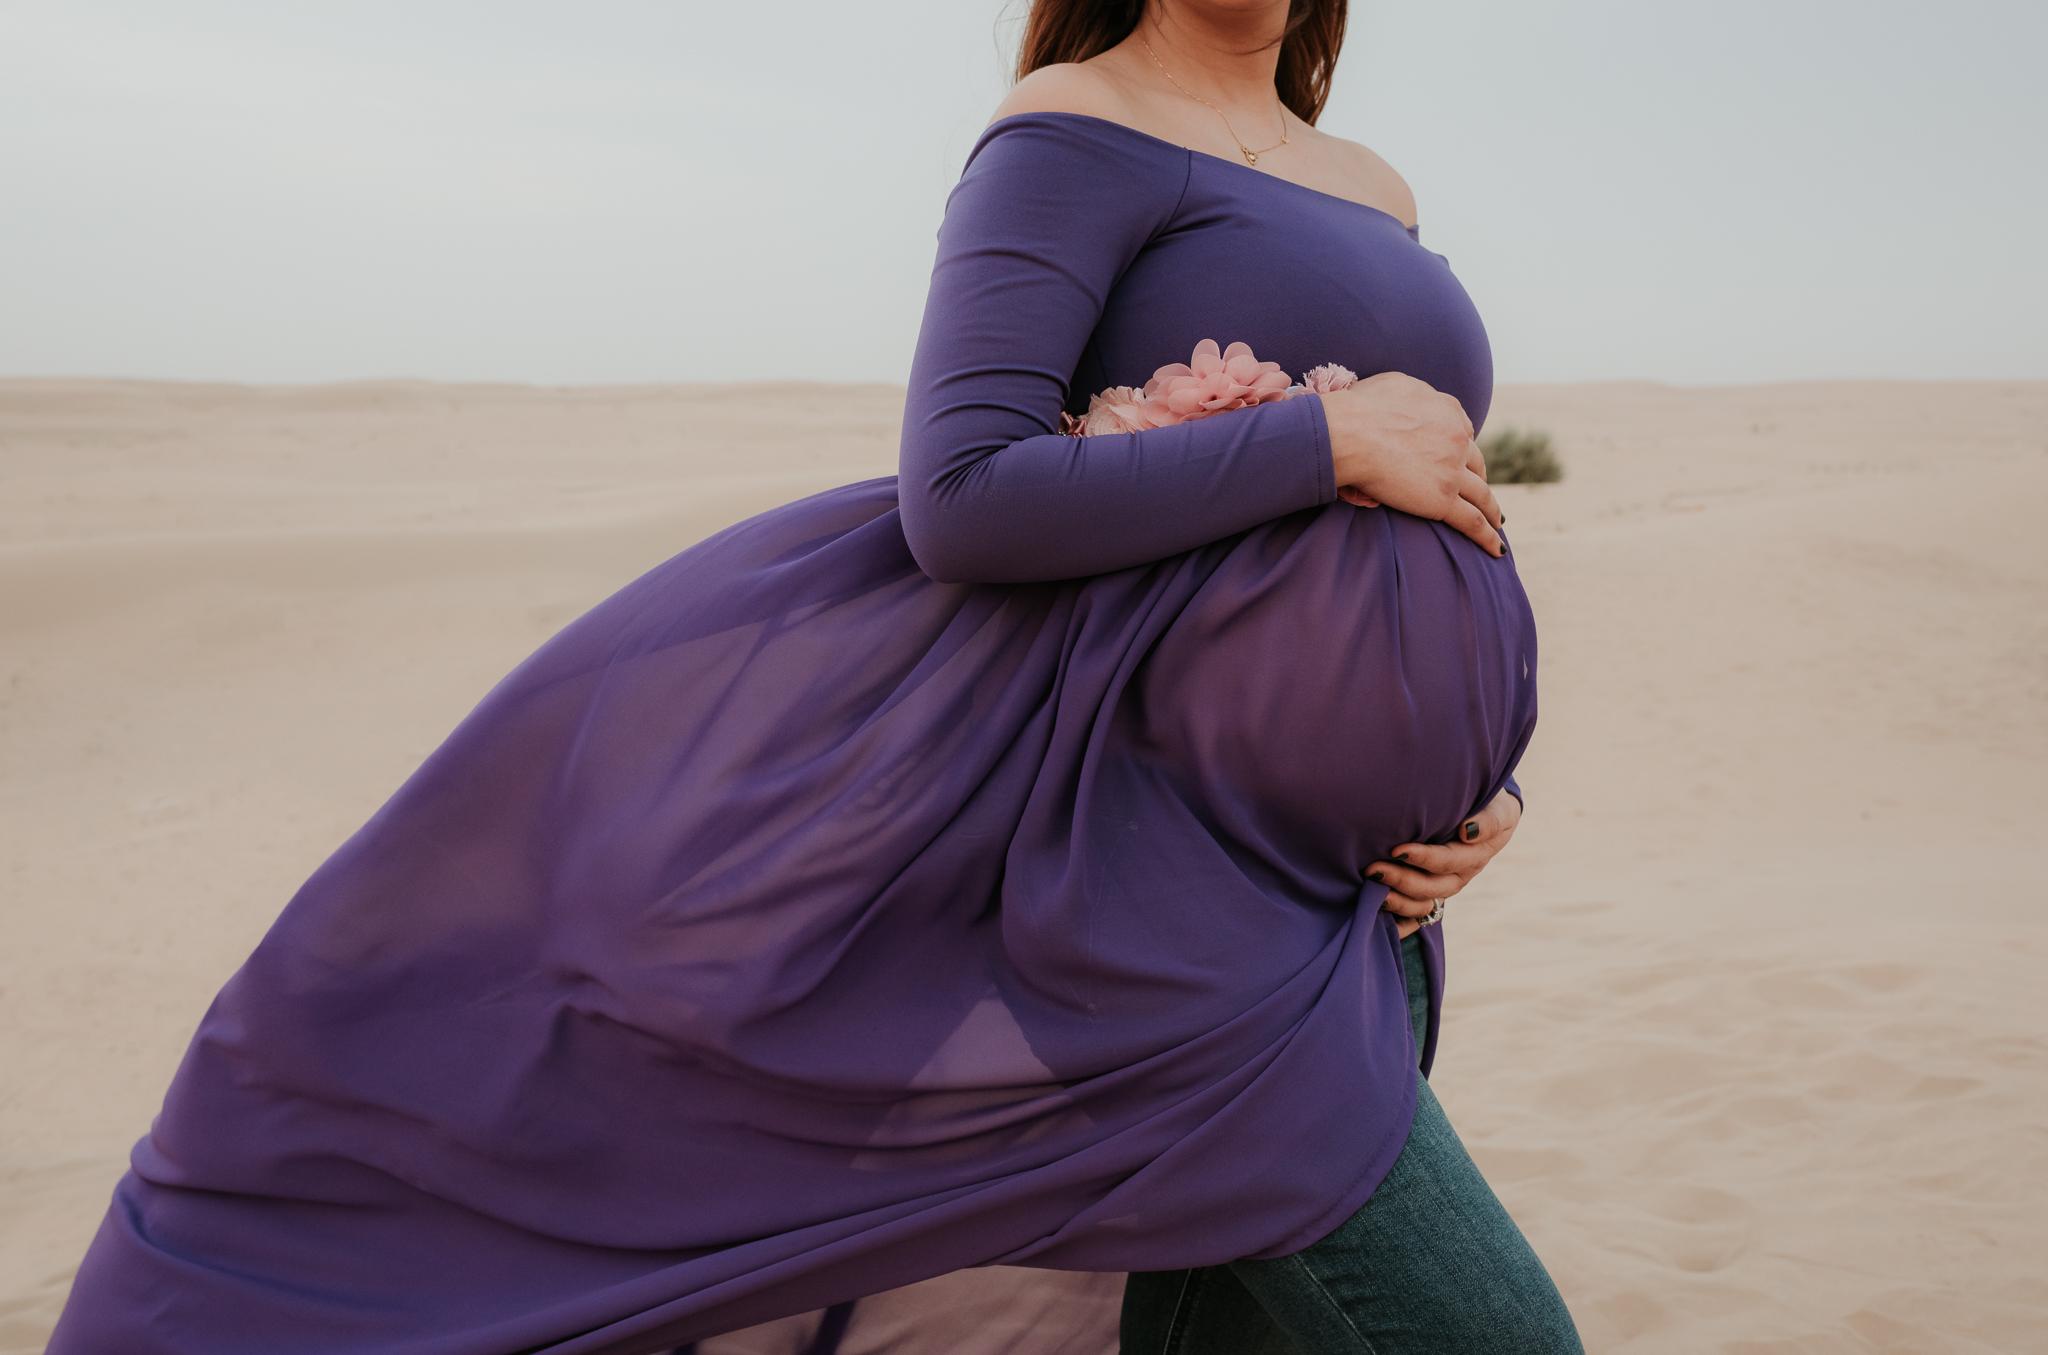 Lana-Photographs-Dubai-Maternity-Photographer-FatimaE-PSLR-57.jpg